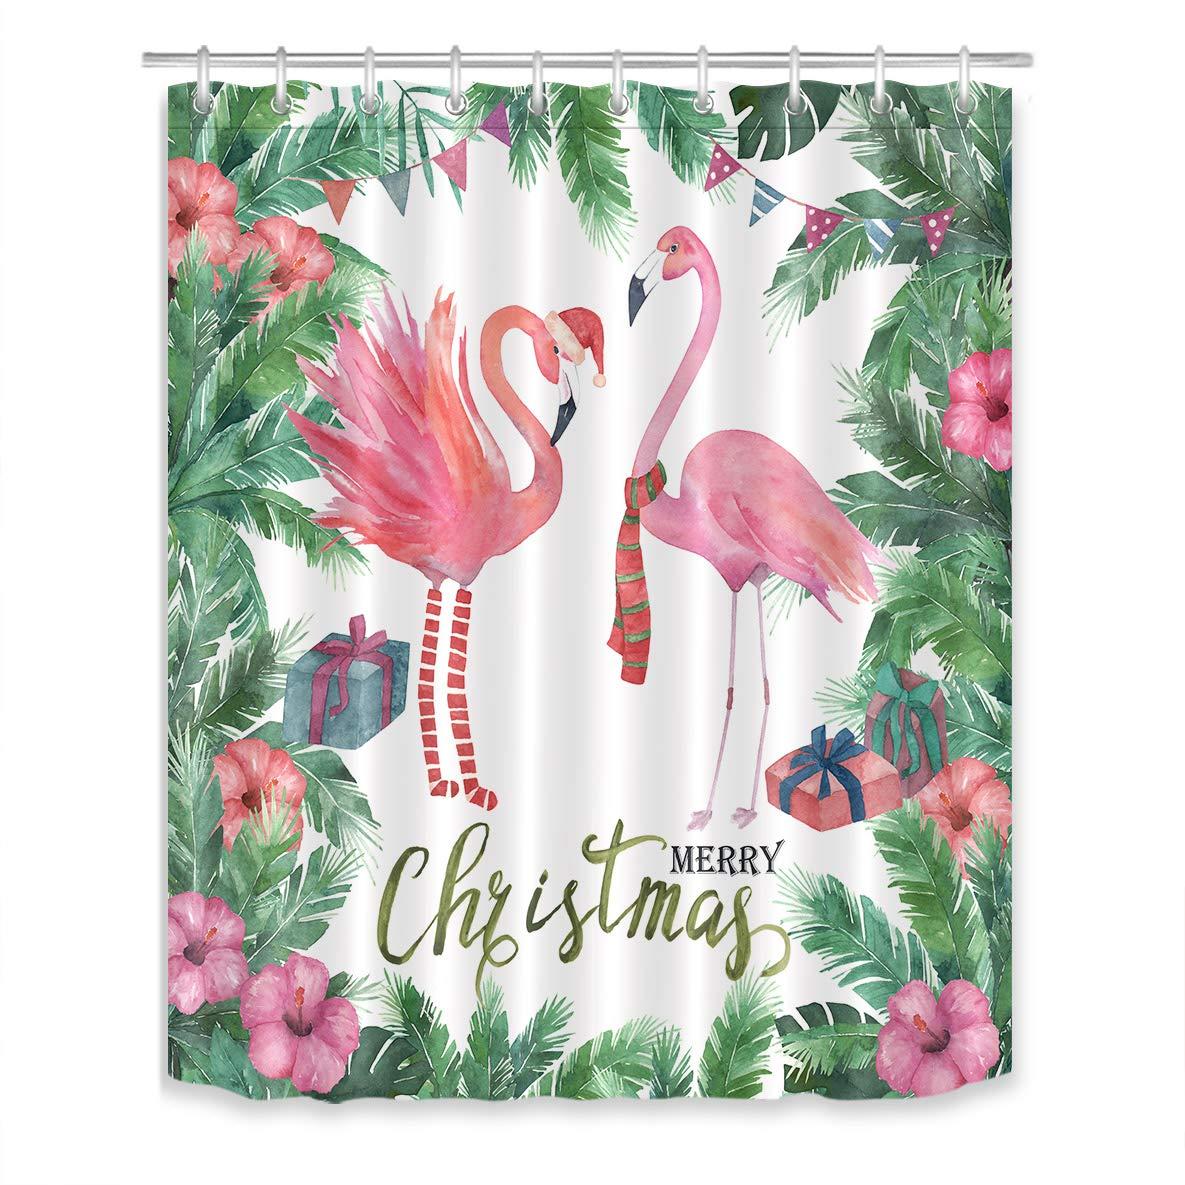 LB Watercolor Christmas Flamingo Shower Curtain Set Green Tropical Plant Palm Leaves Bathroom Curtain Decor,Bath Curtain Hooks Include,60x72 inch Waterproof Fabric